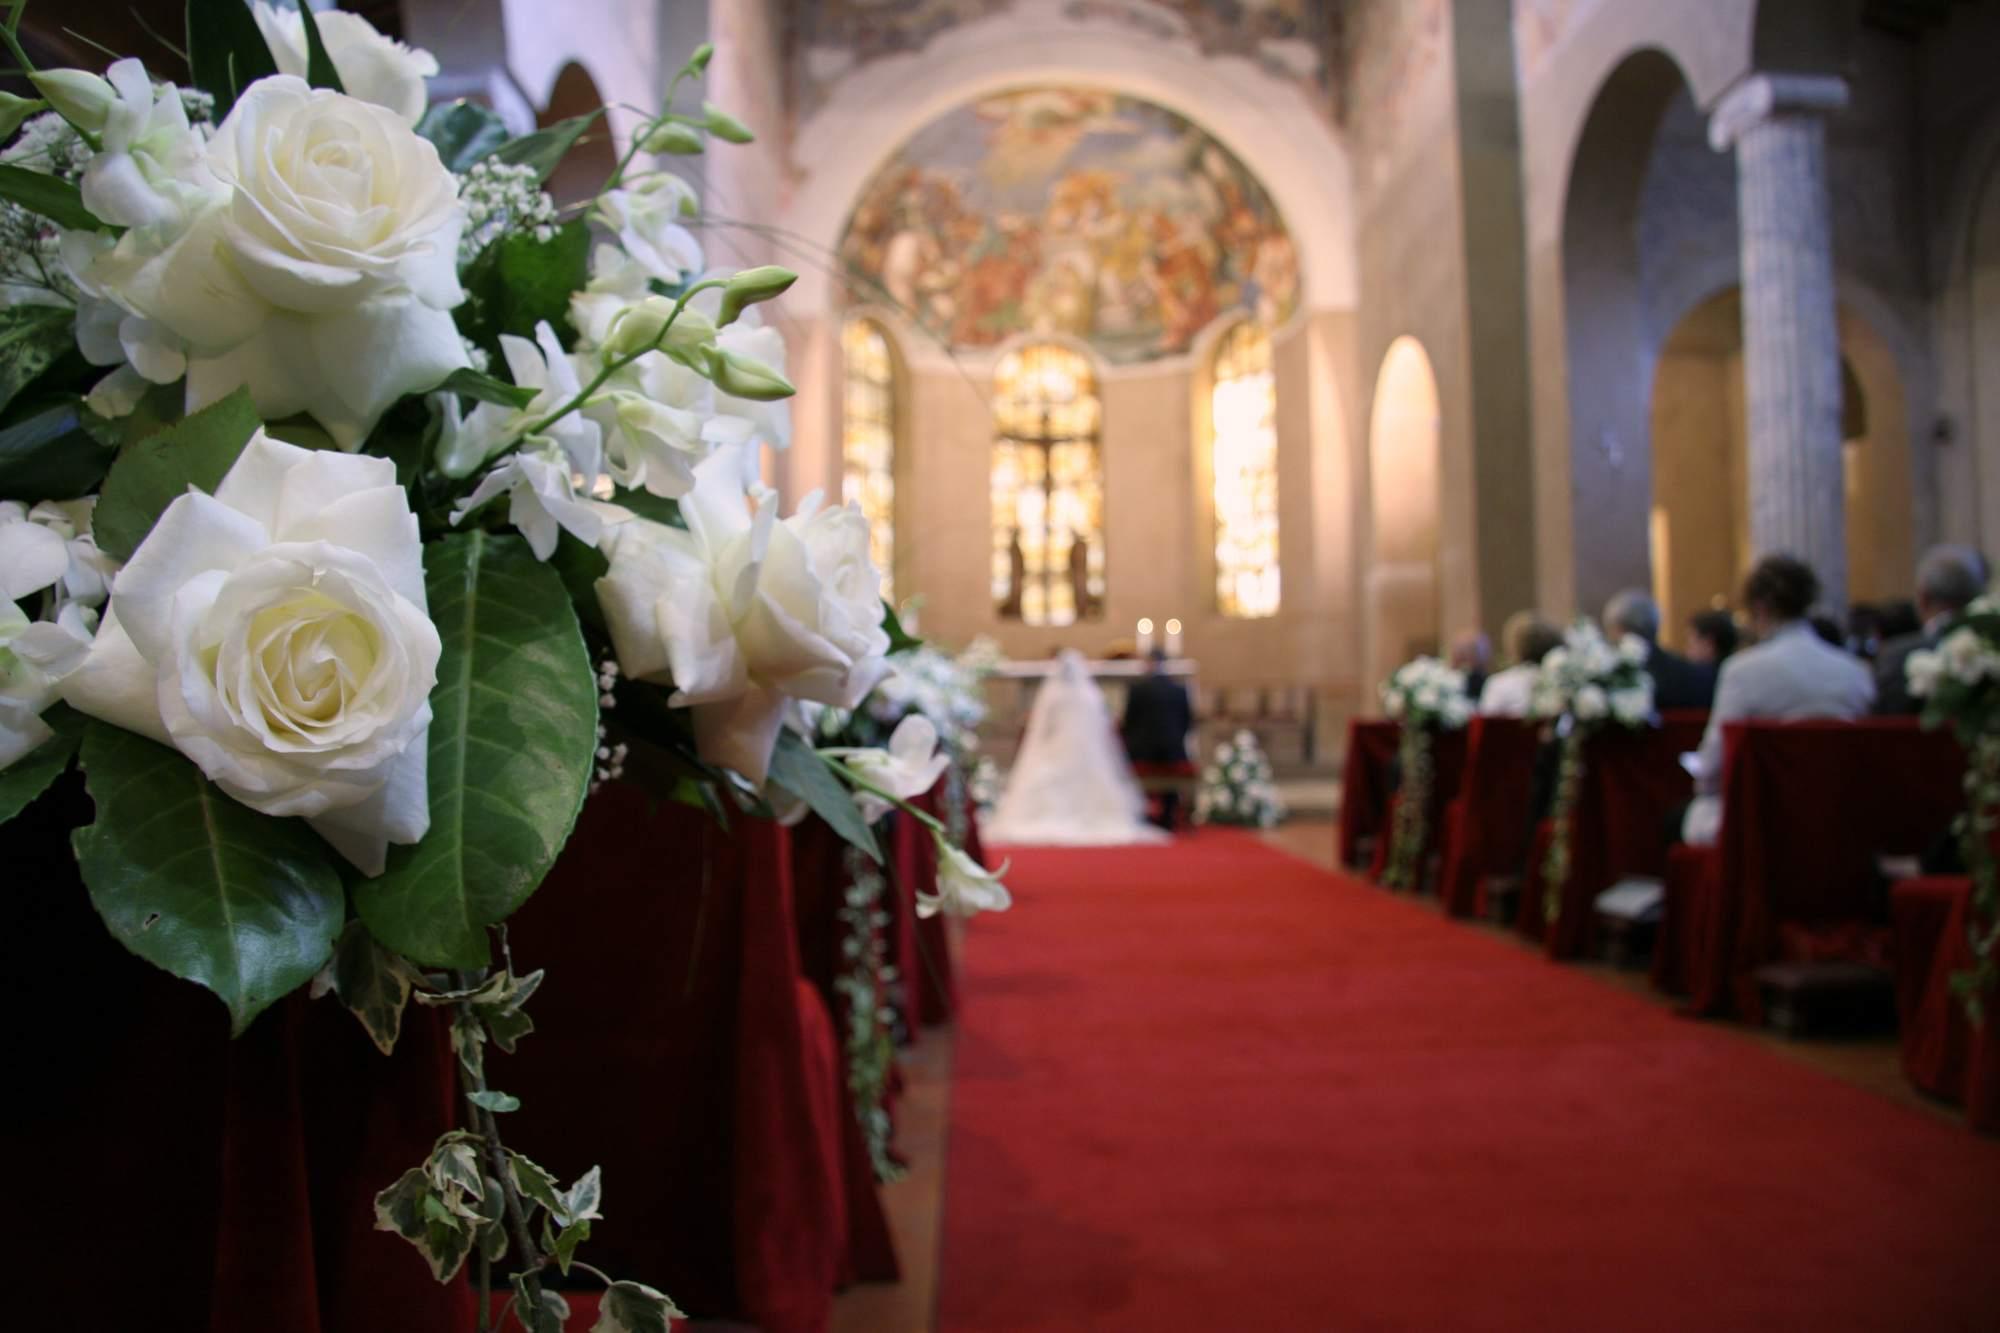 Roses in wedding aisle